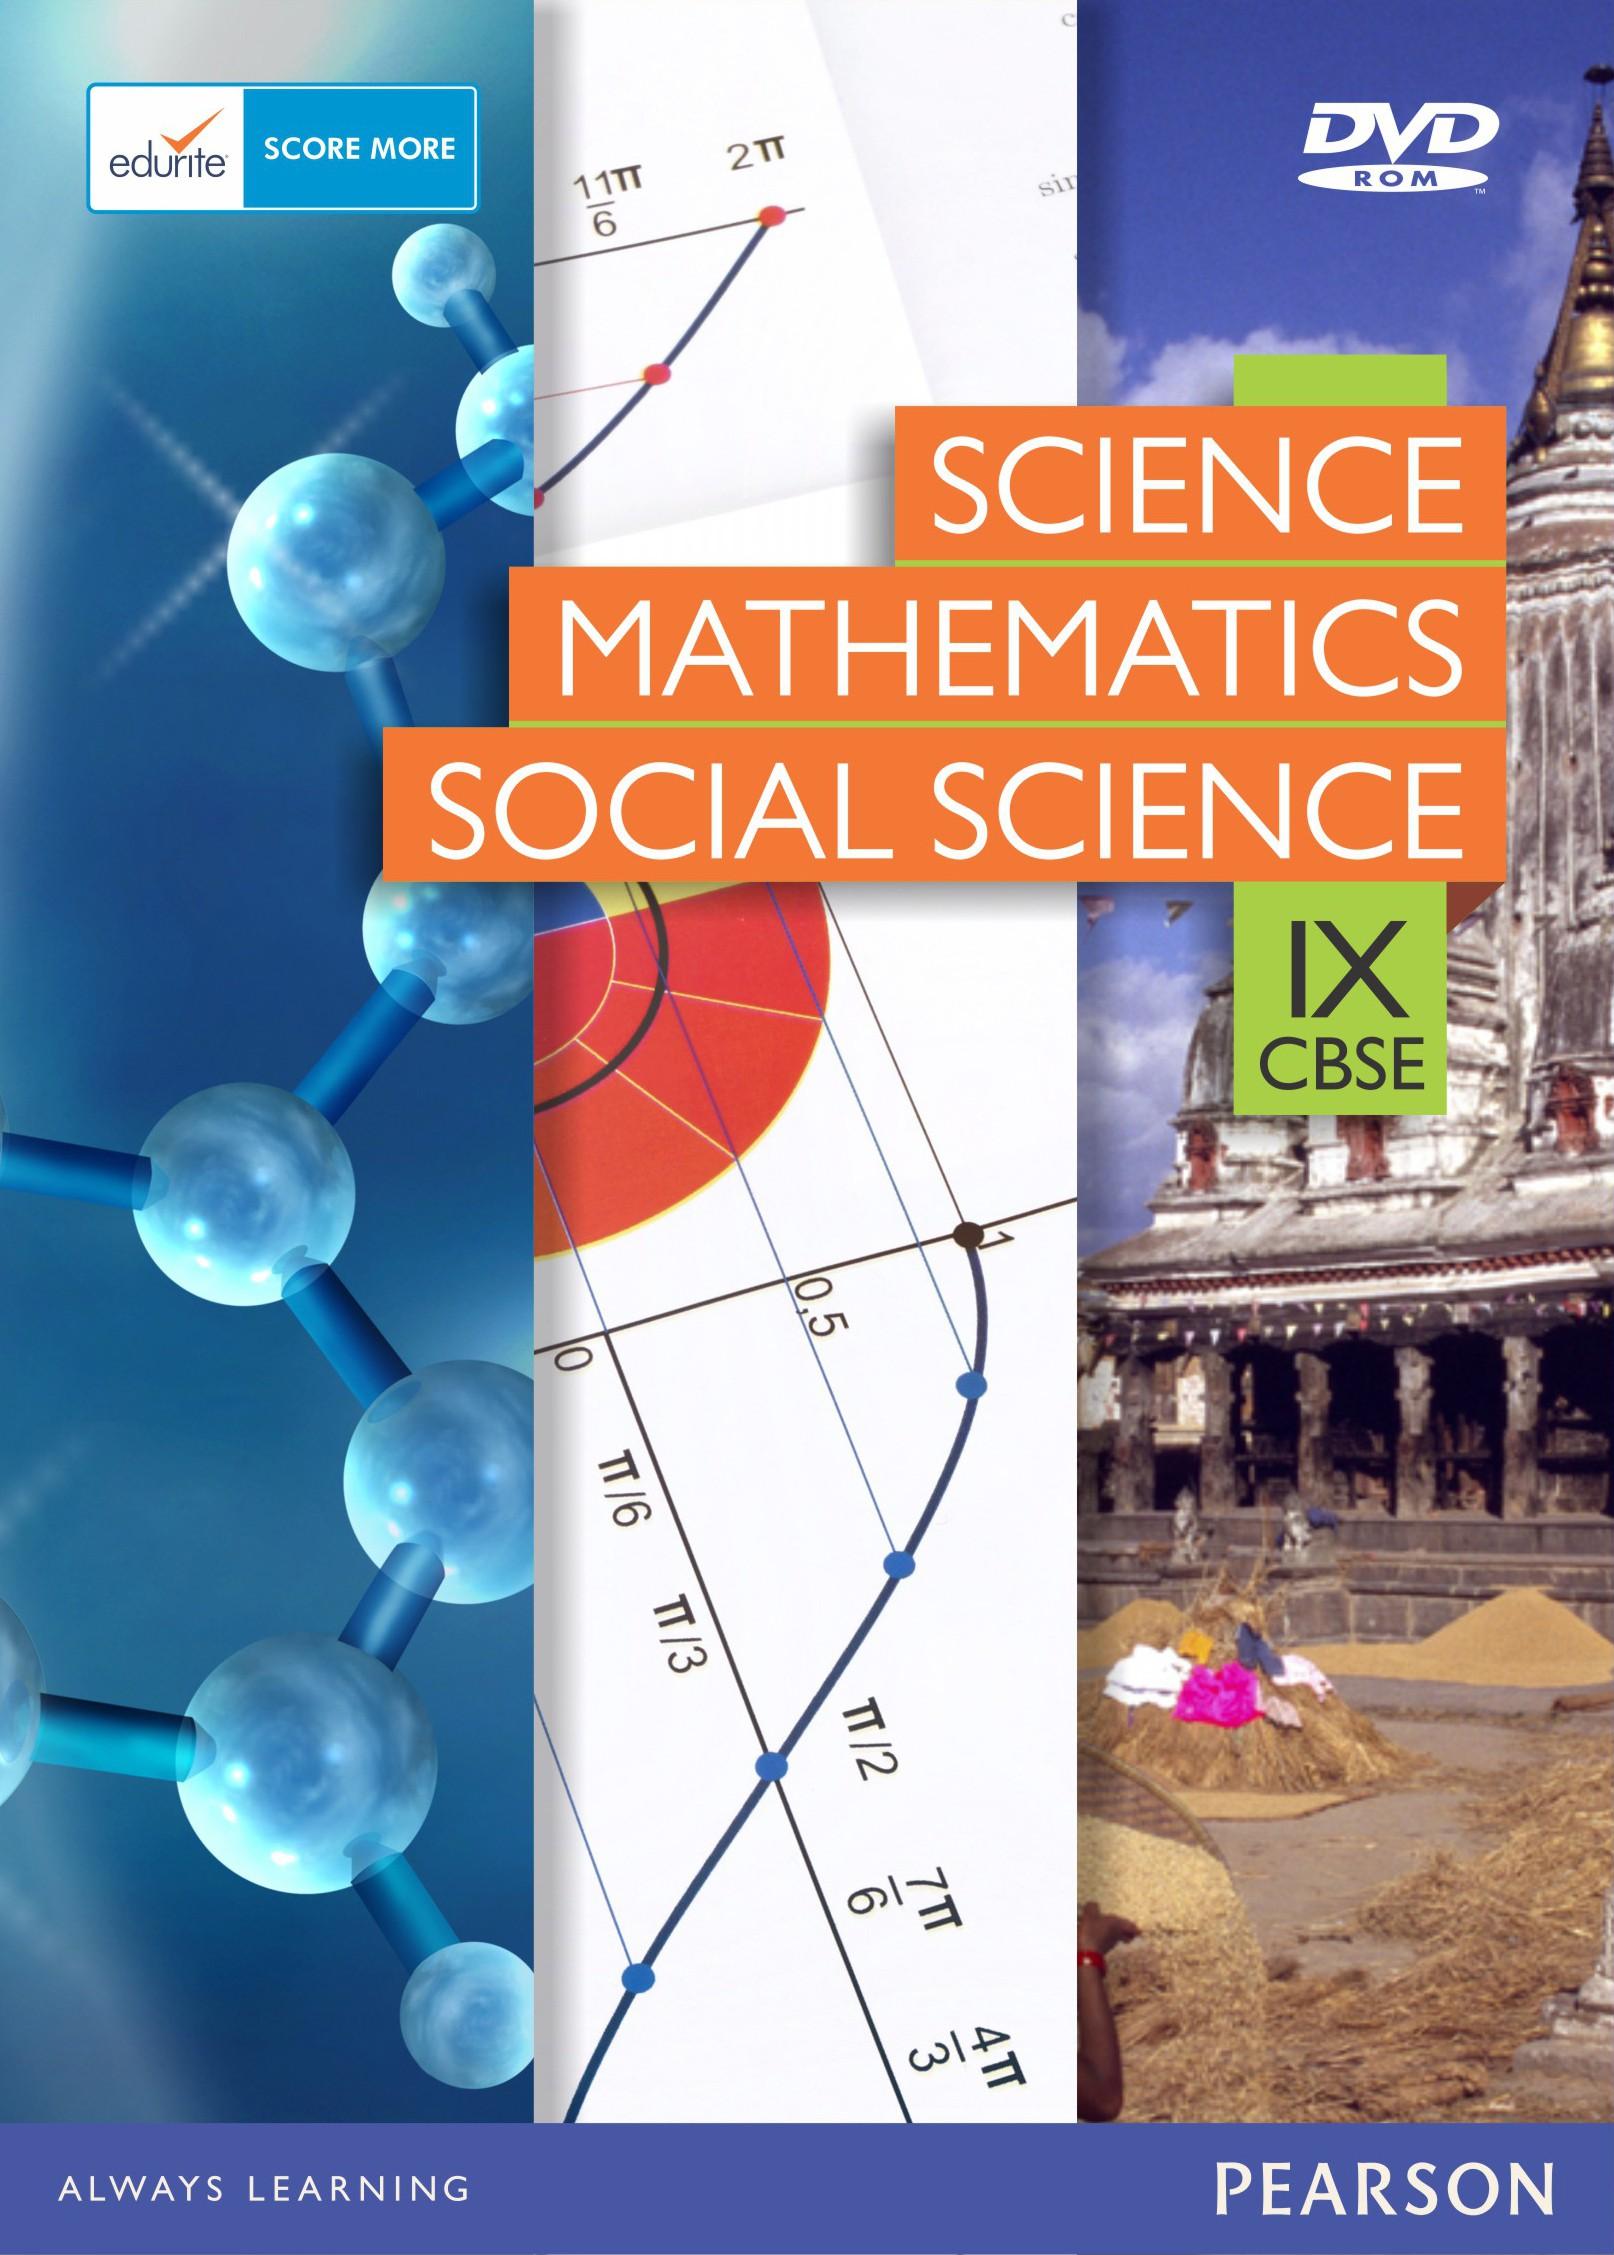 Edurite CBSE Class 9 Combo (Science, Maths,Social Science)(DVD)